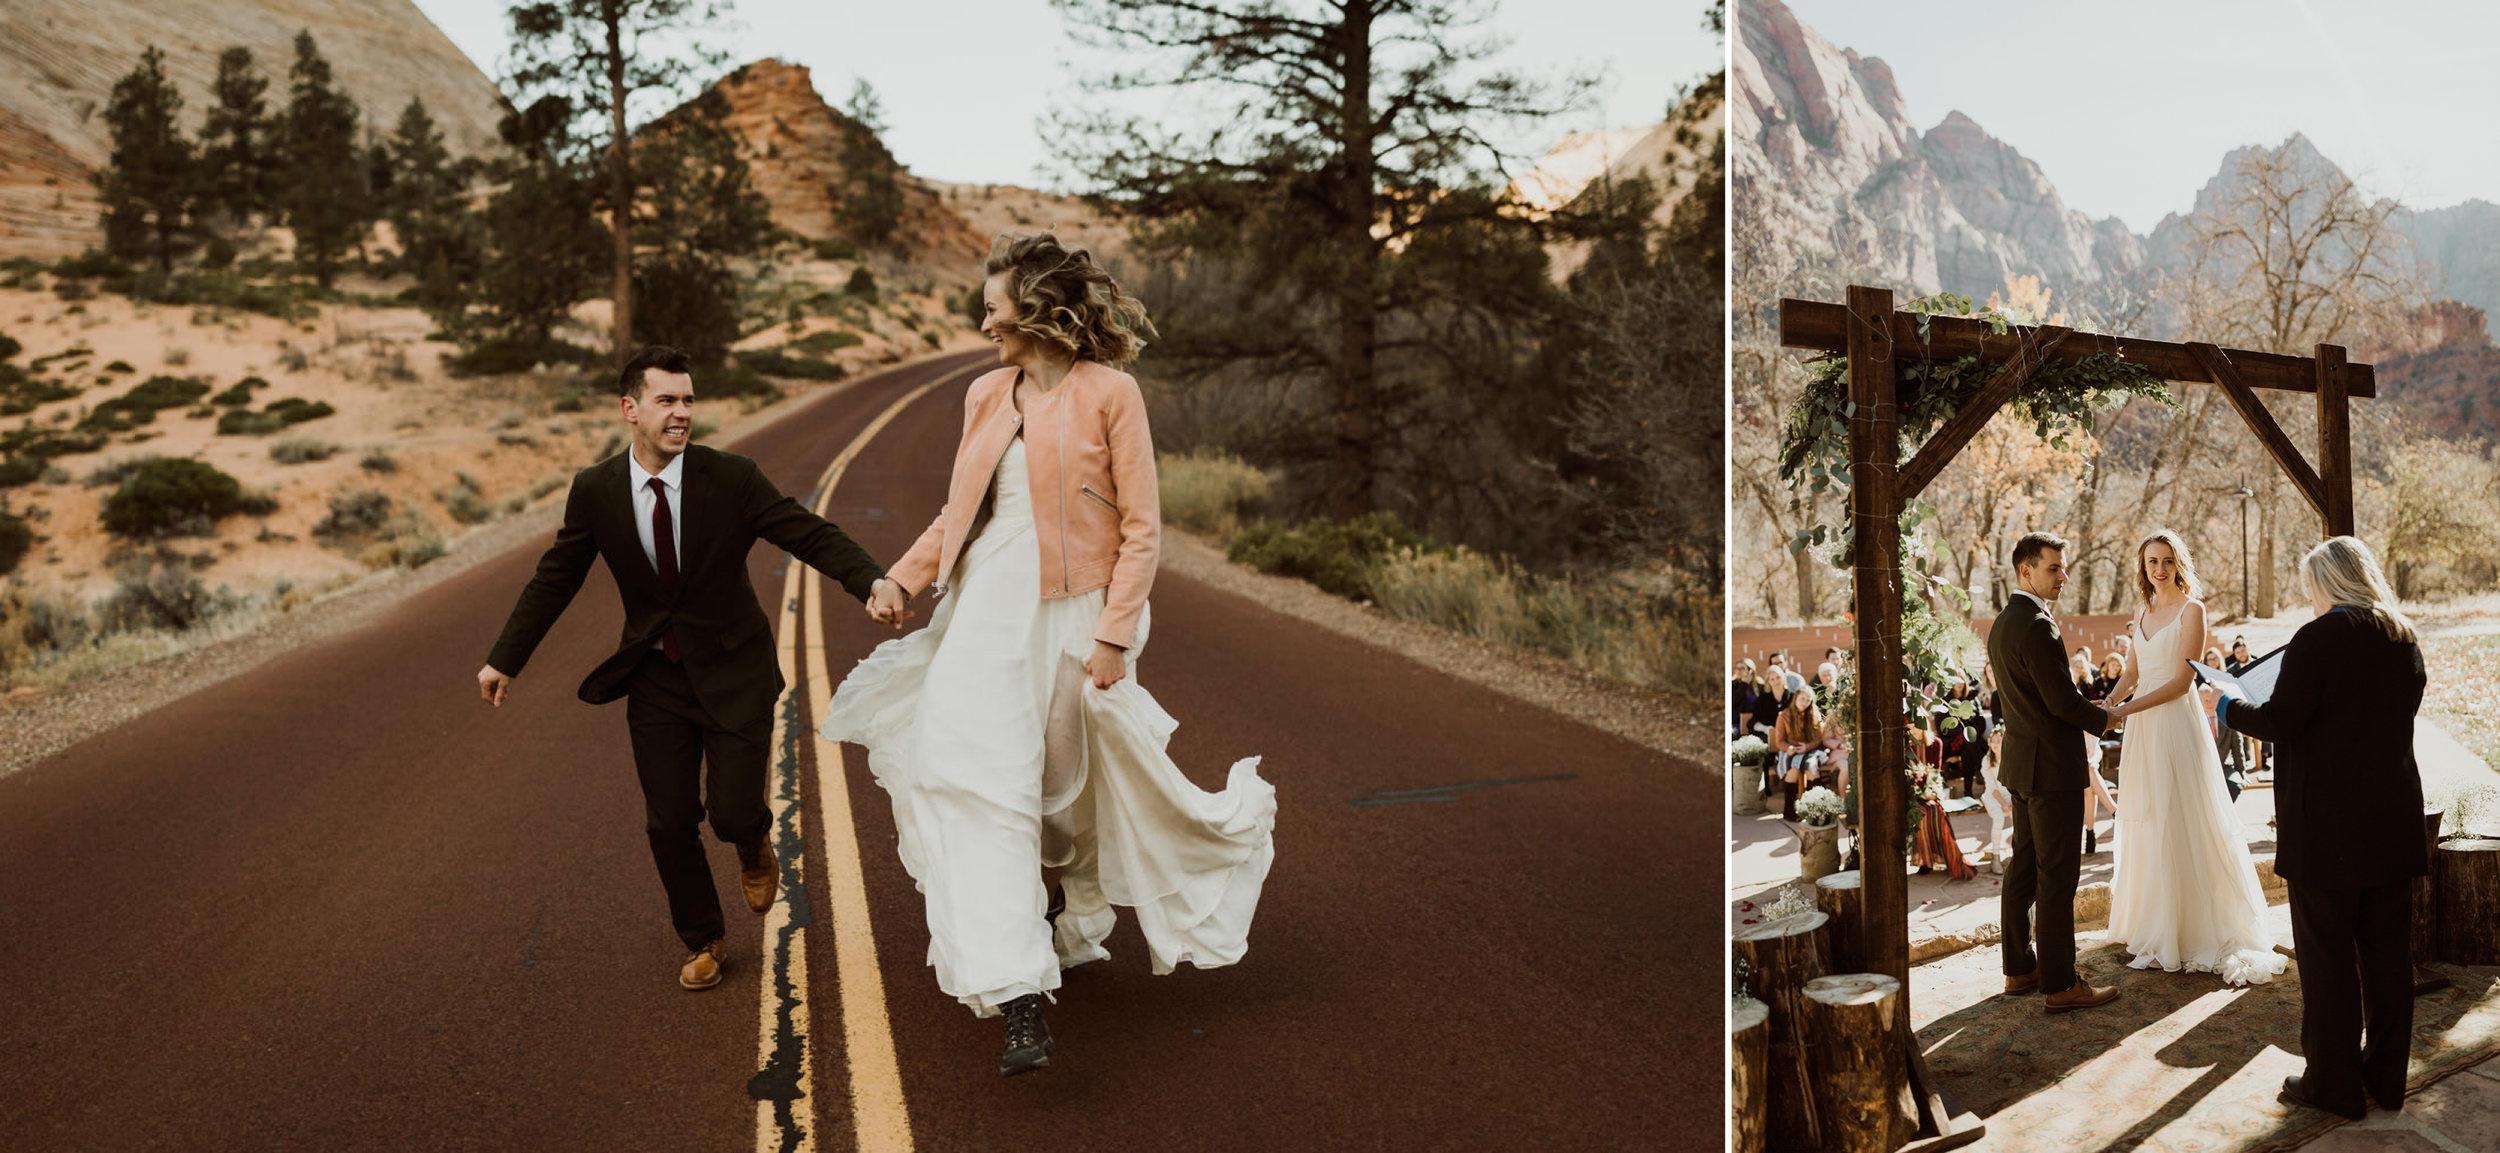 17-12-adventure-wedding-photographer-19.jpg